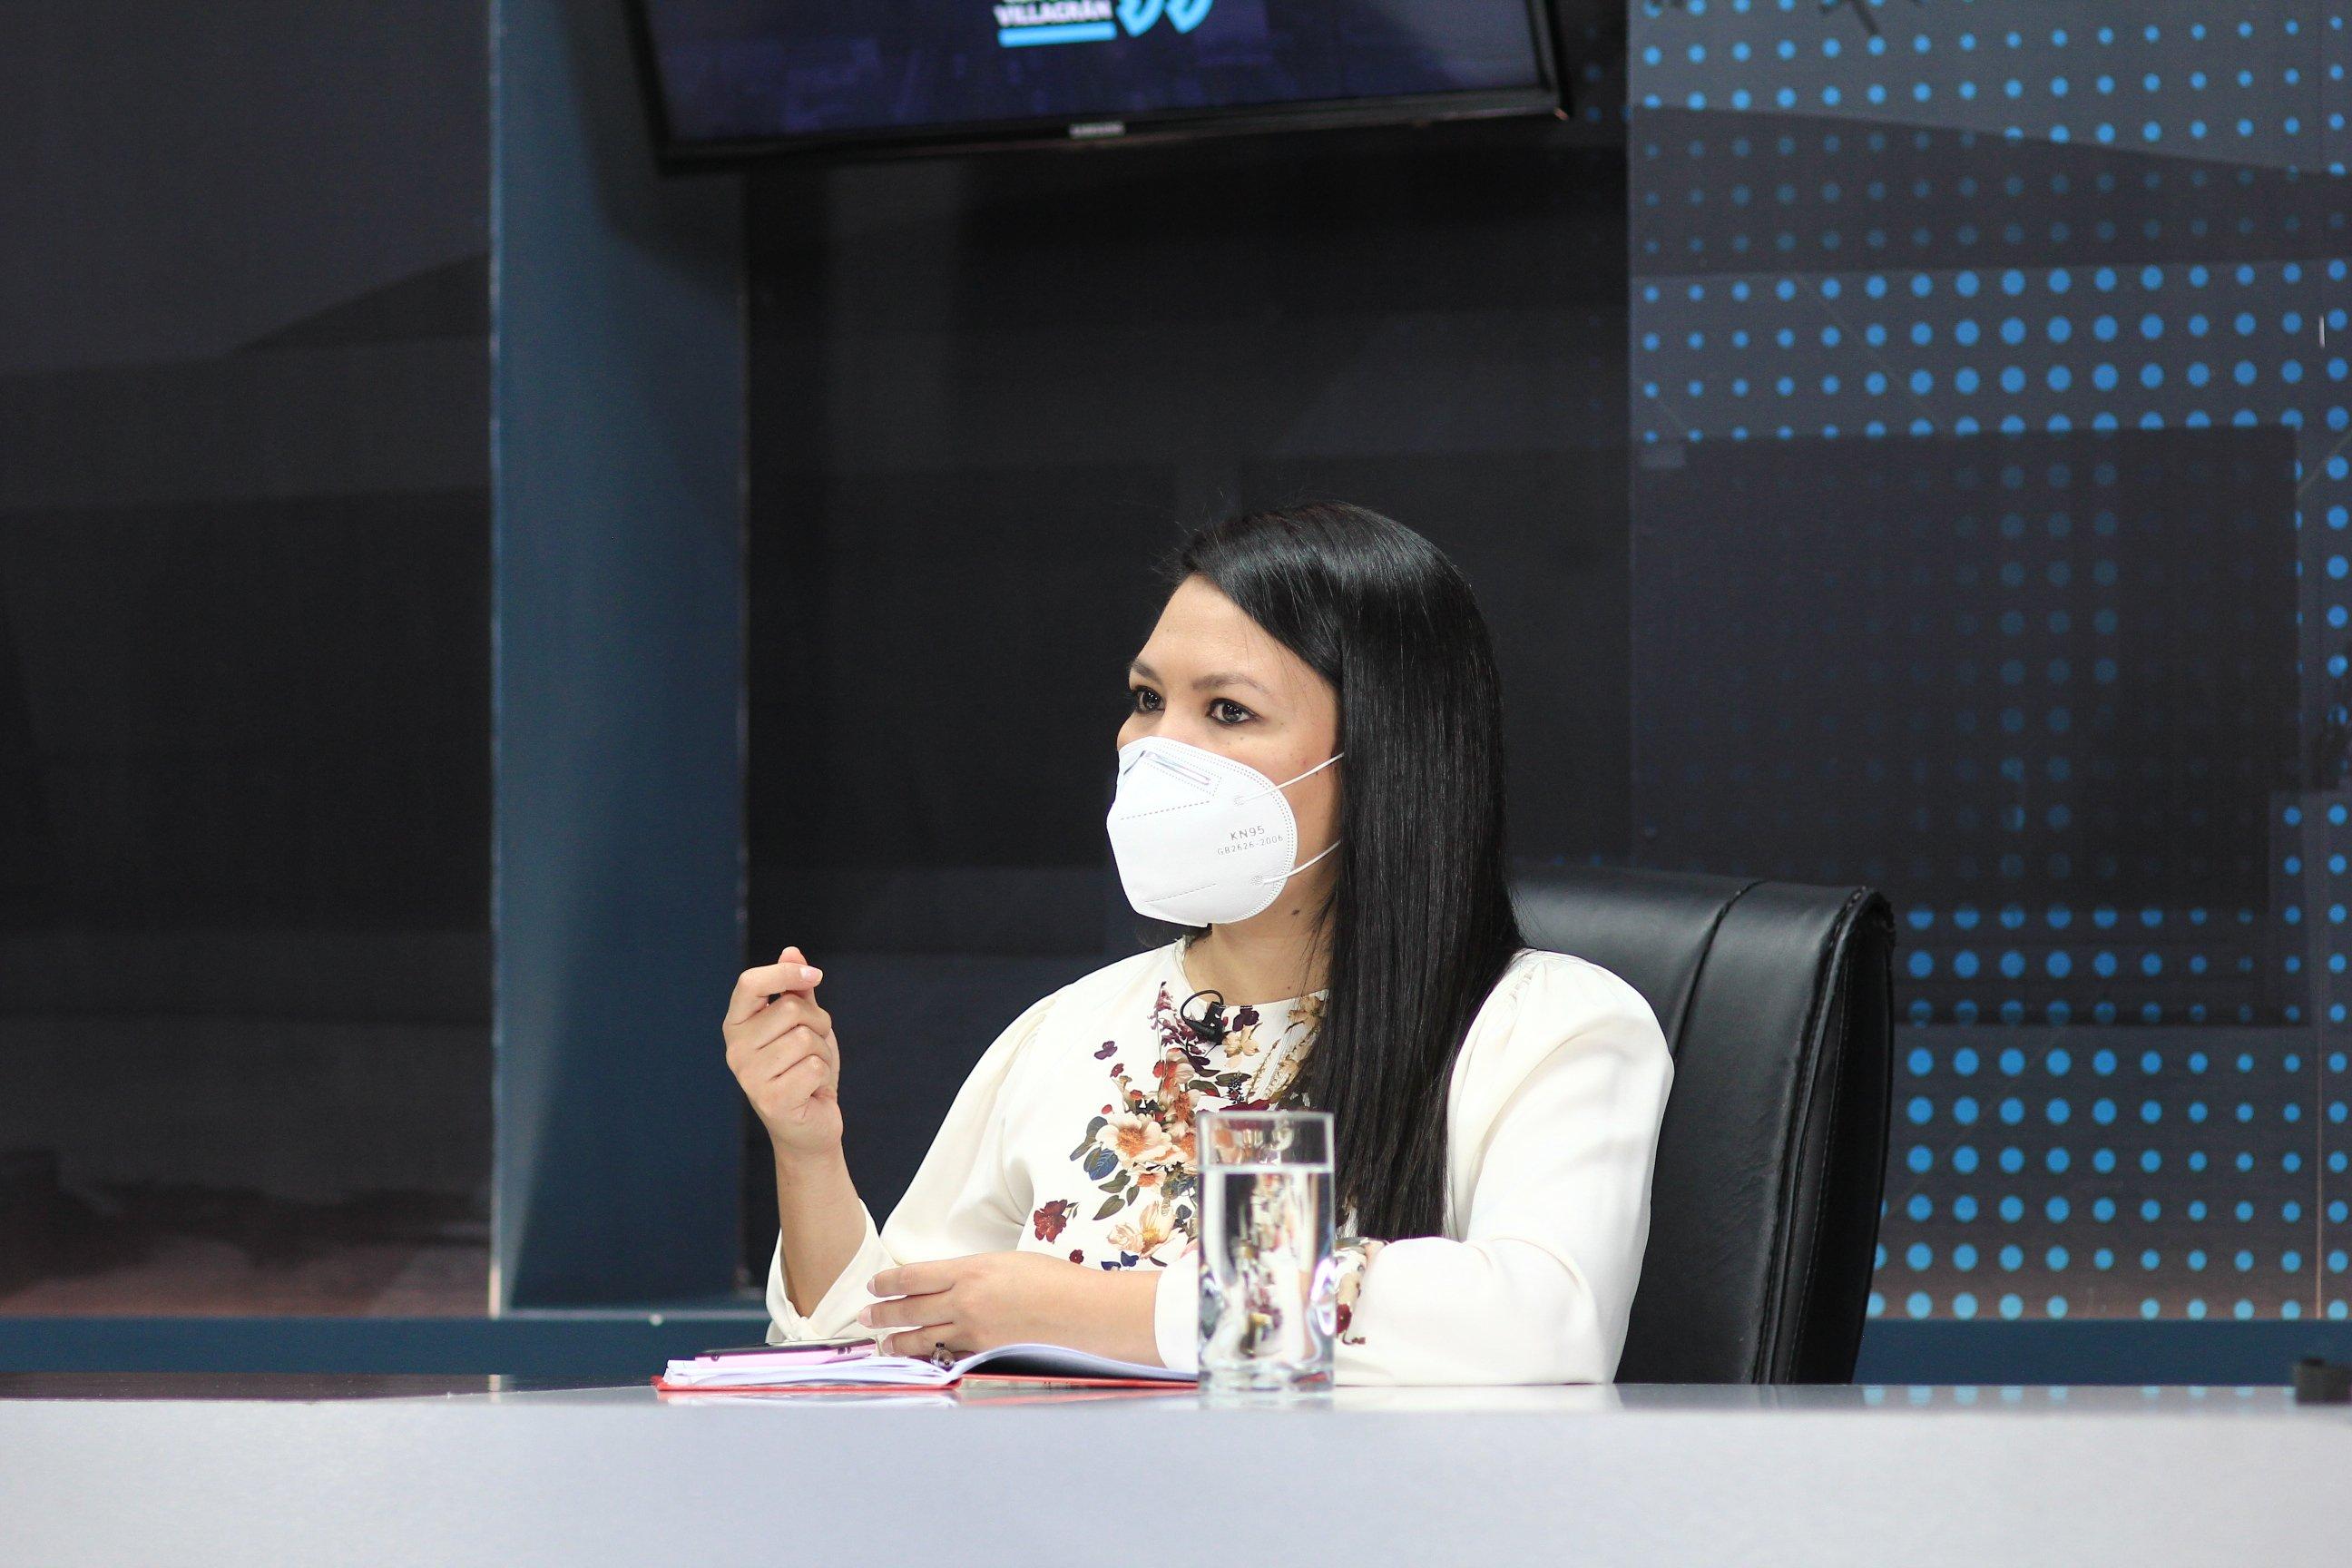 FMLN a favor de aprobar cuarentenas focalizadas